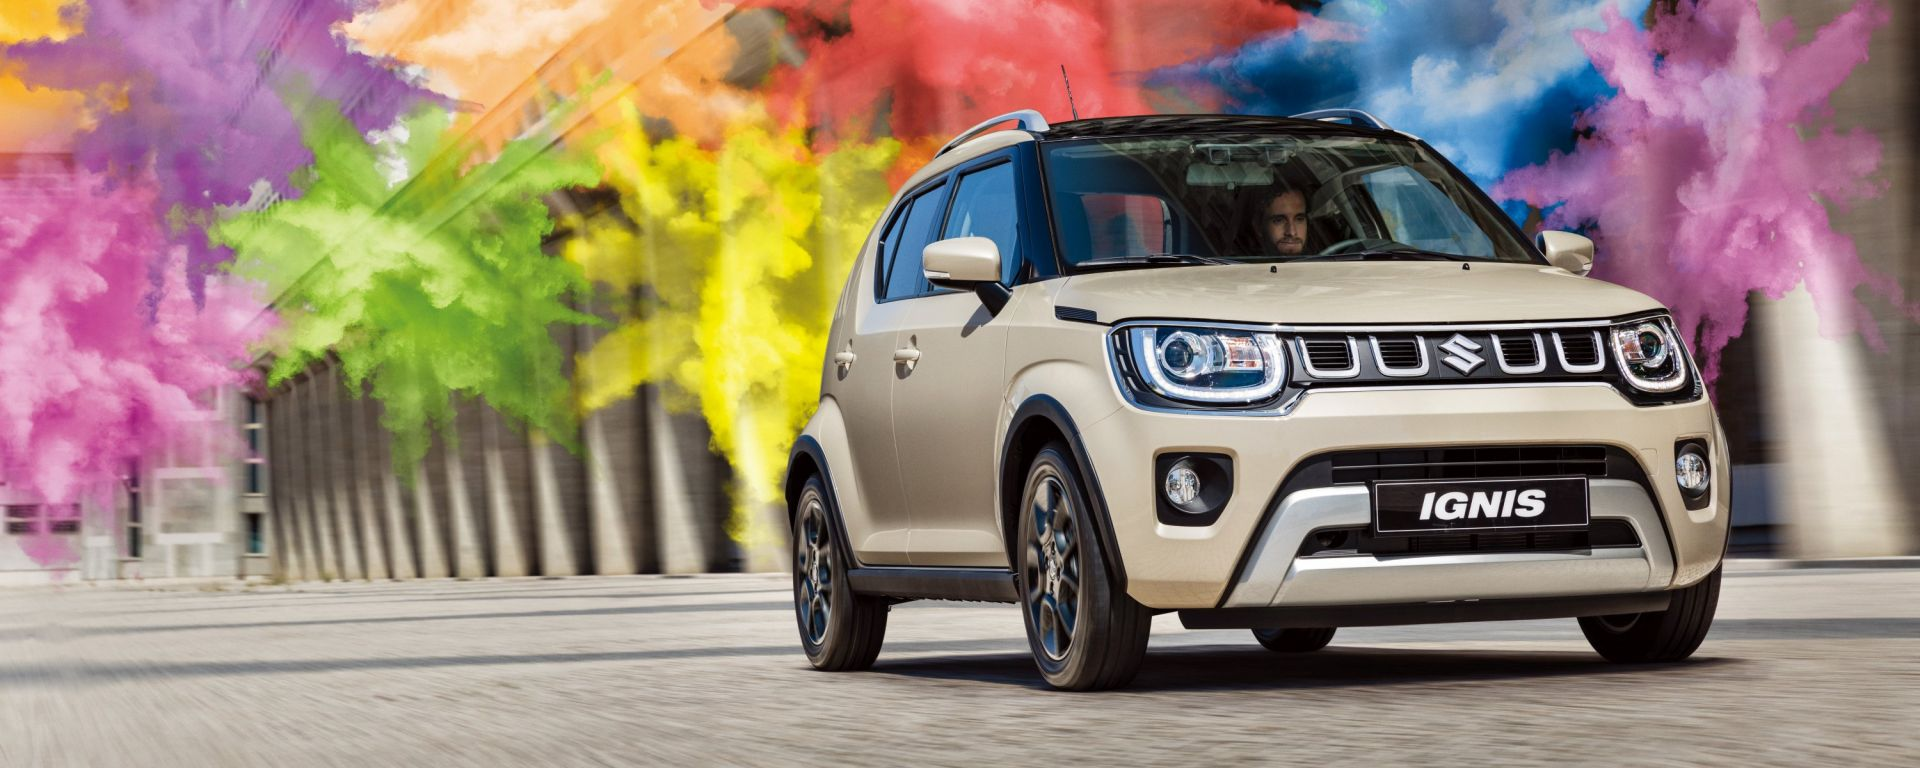 Nuova Suzuki Ignis Hybrid 2020: in Italia da aprile